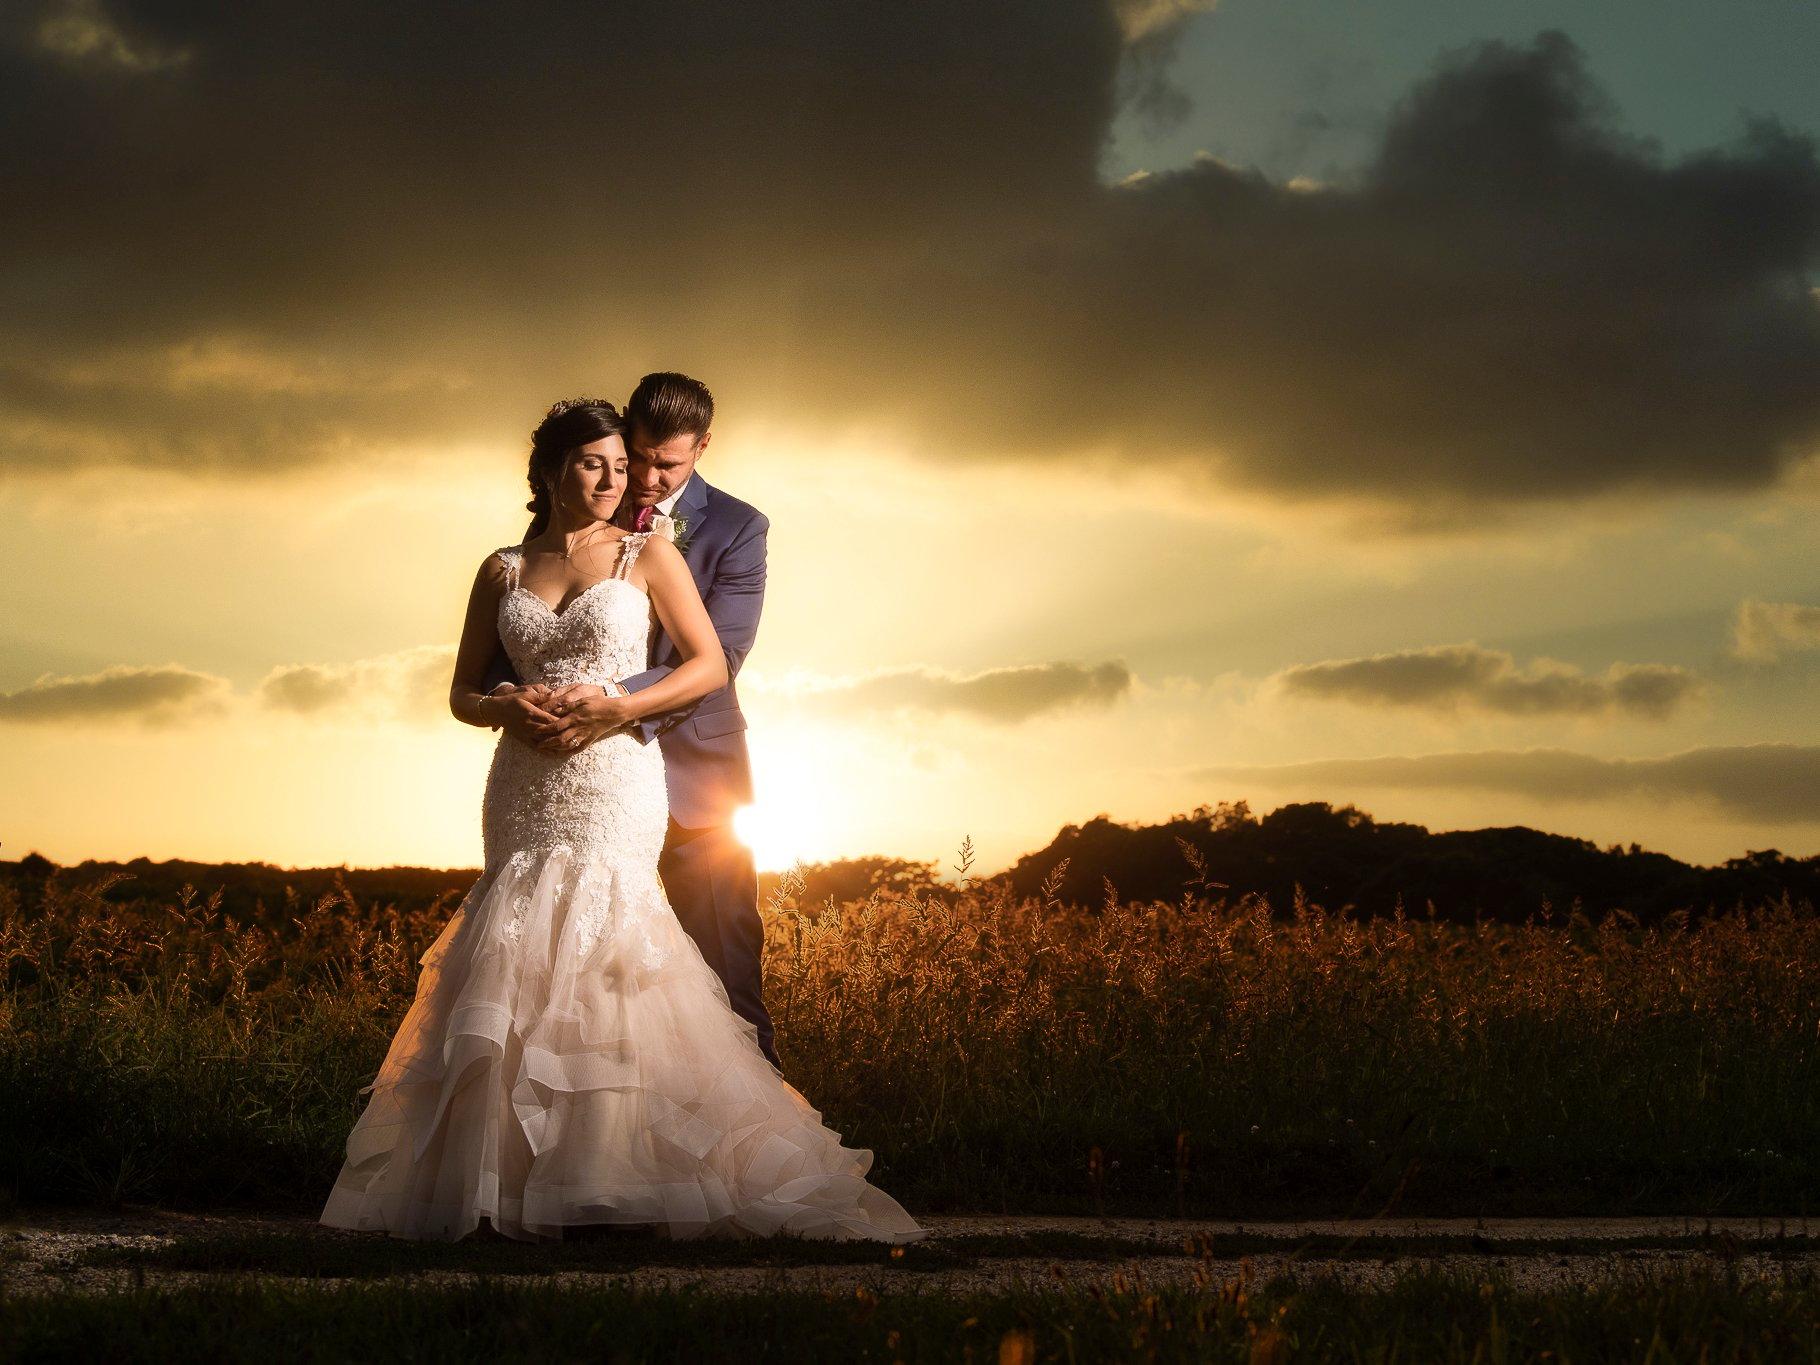 The Best Wedding Photos at The Vineyards at Aquebogue-1